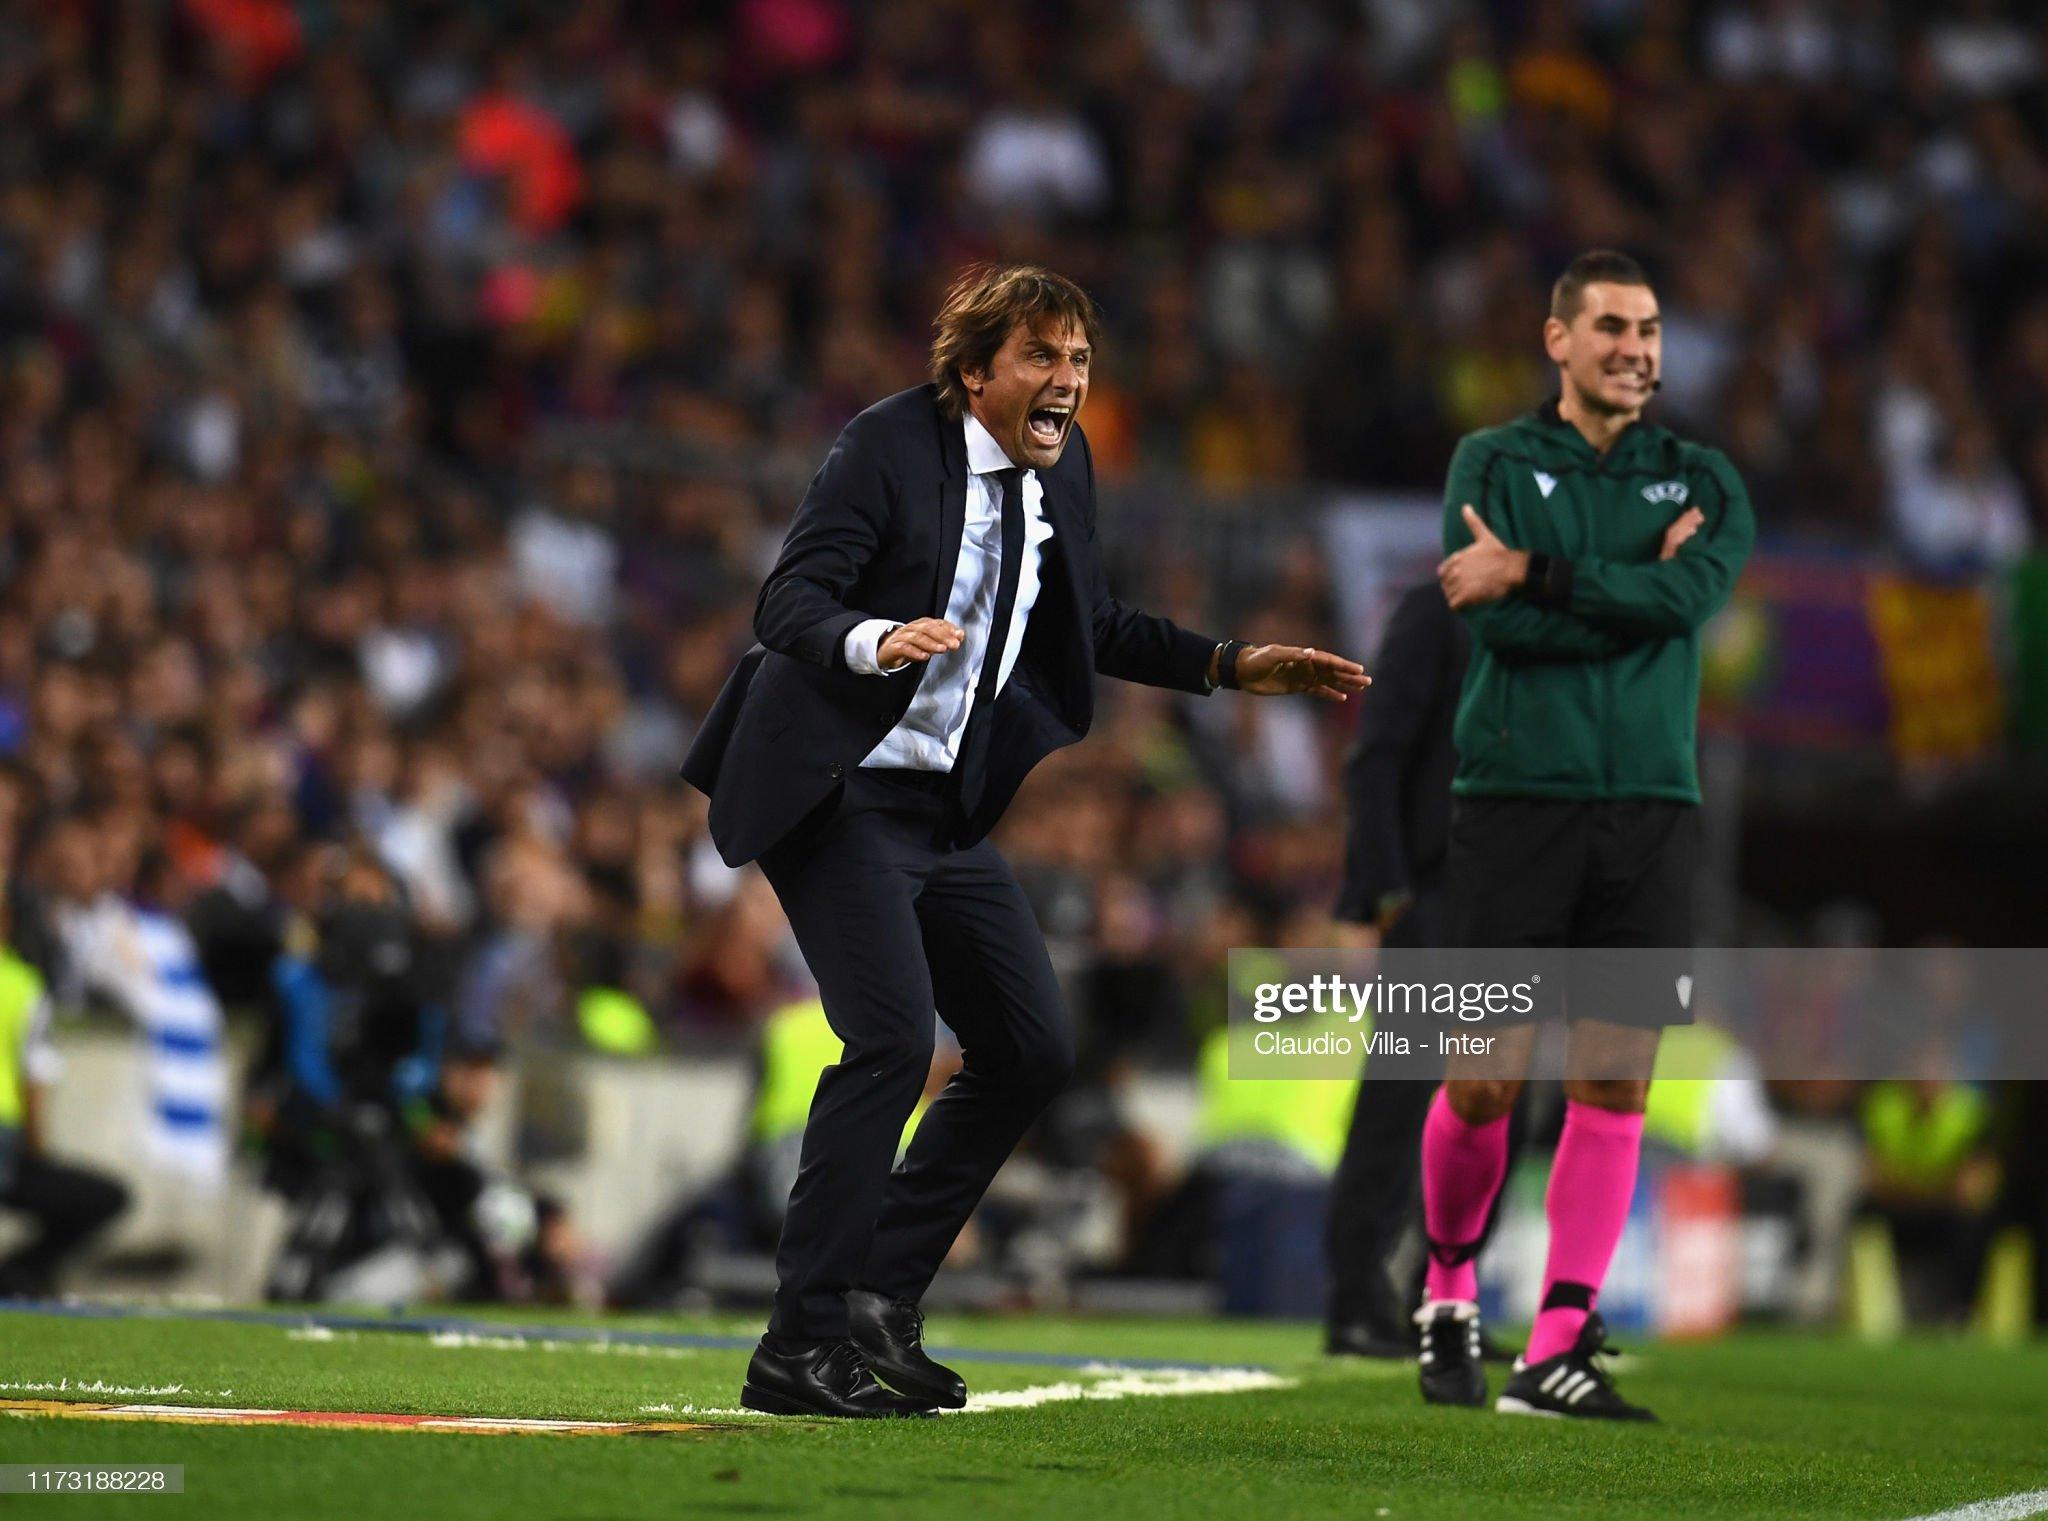 صور مباراة : برشلونة - إنتر 2-1 ( 02-10-2019 )  Head-coach-fc-internazionale-antonio-conte-reacts-during-the-uefa-picture-id1173188228?s=2048x2048